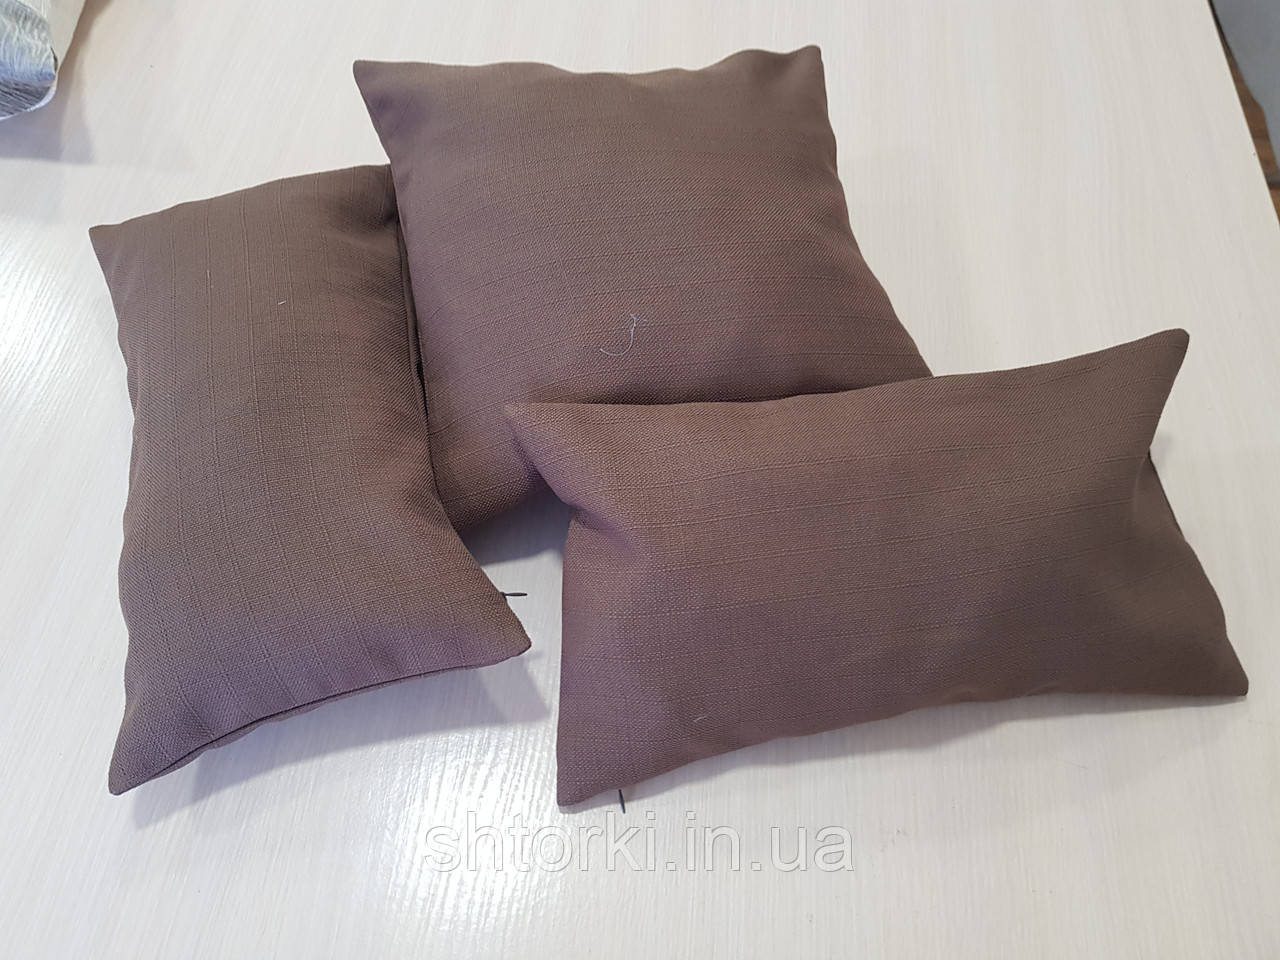 Комплект подушек  коричневые структура мешковинки, 3шт